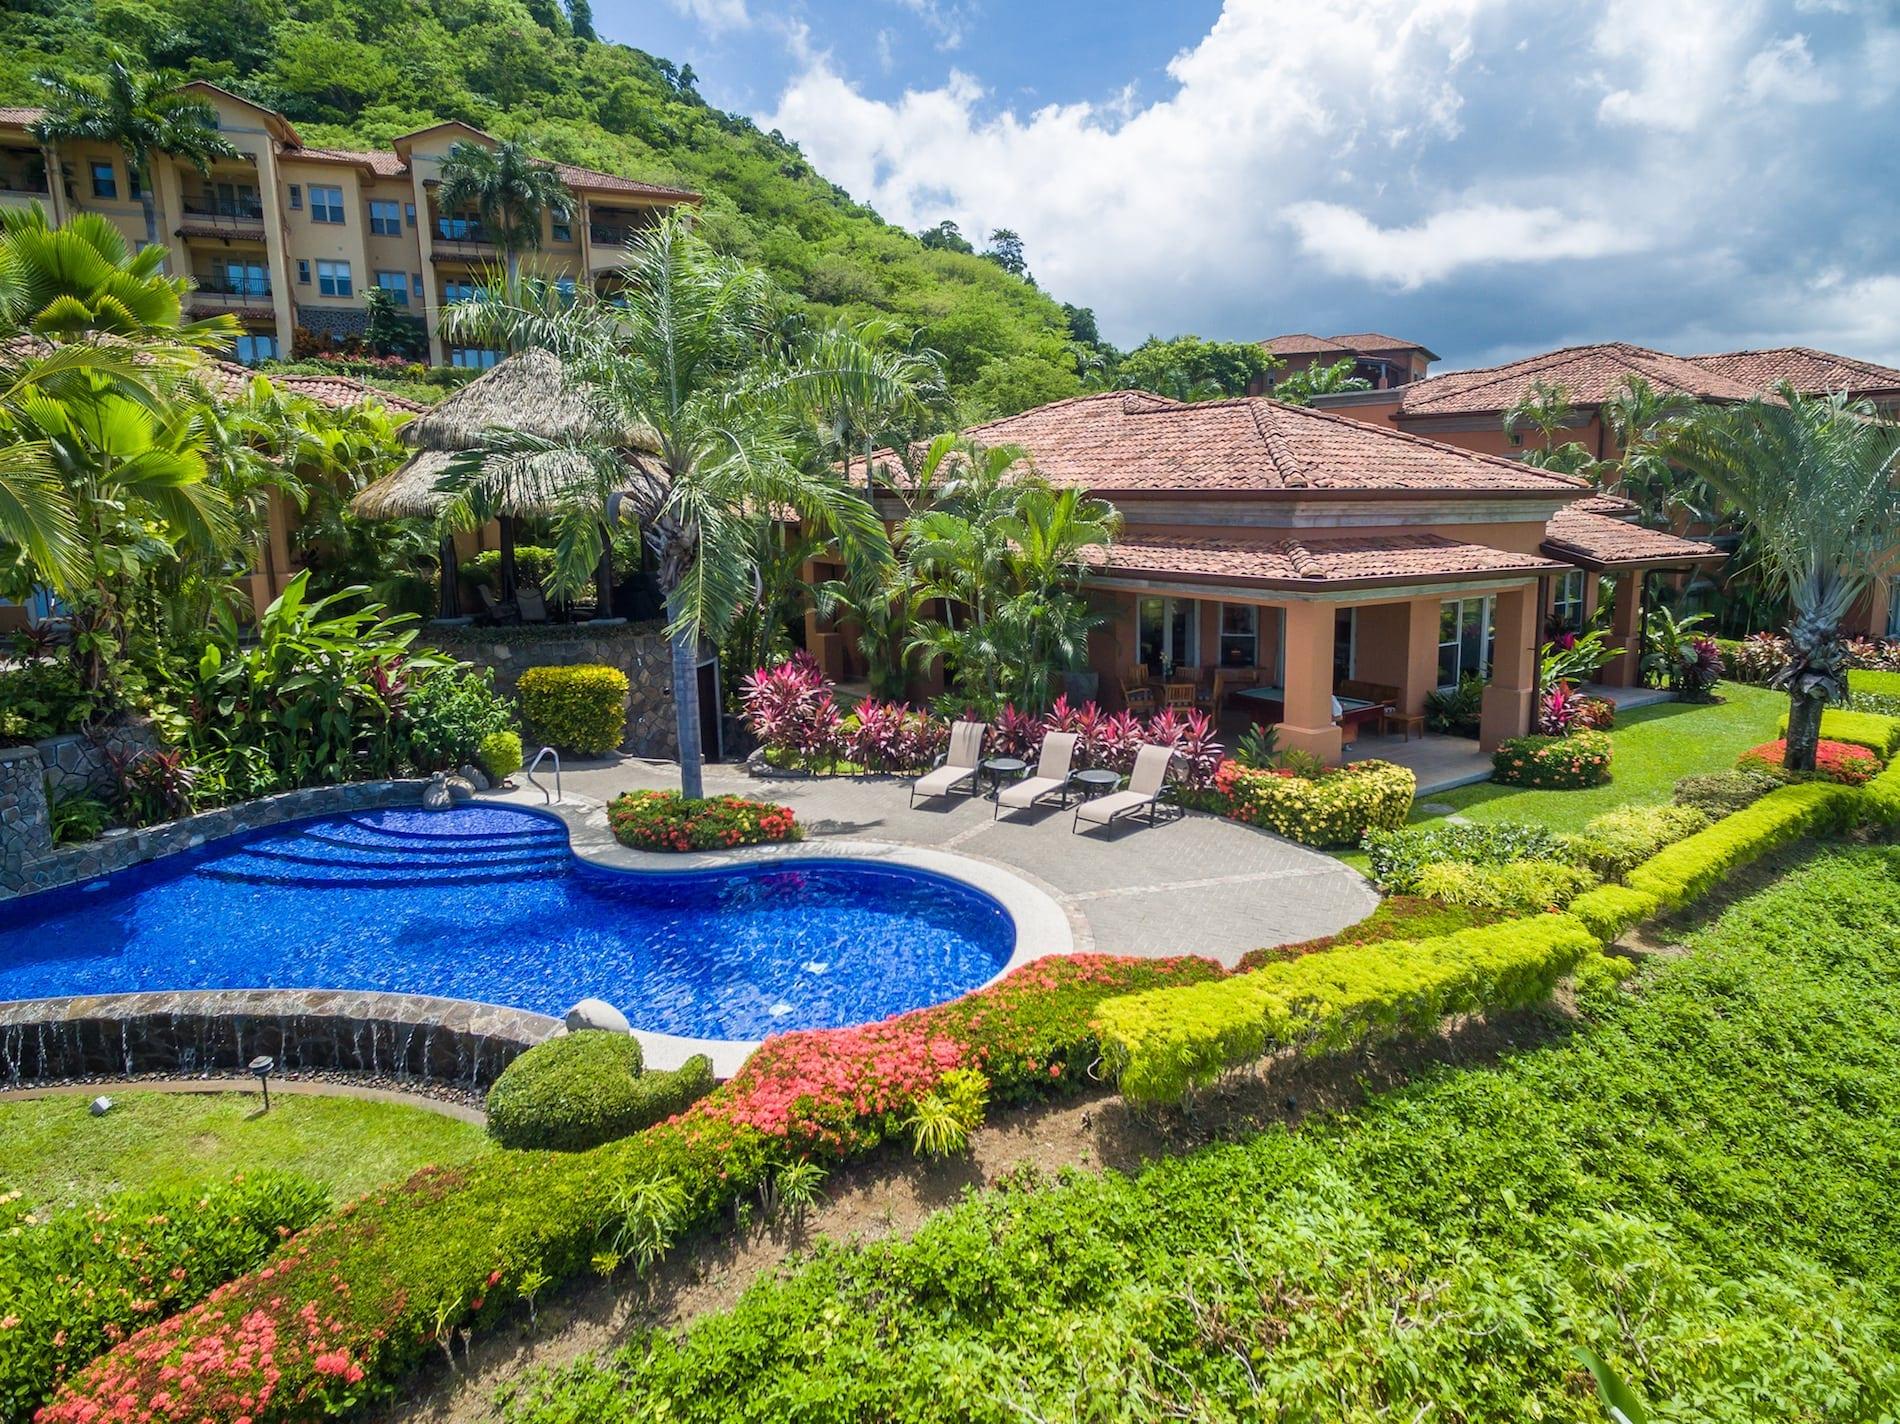 CONDO - 3 Bedroom Stand Alone Ocean View Villa With Pool!!!